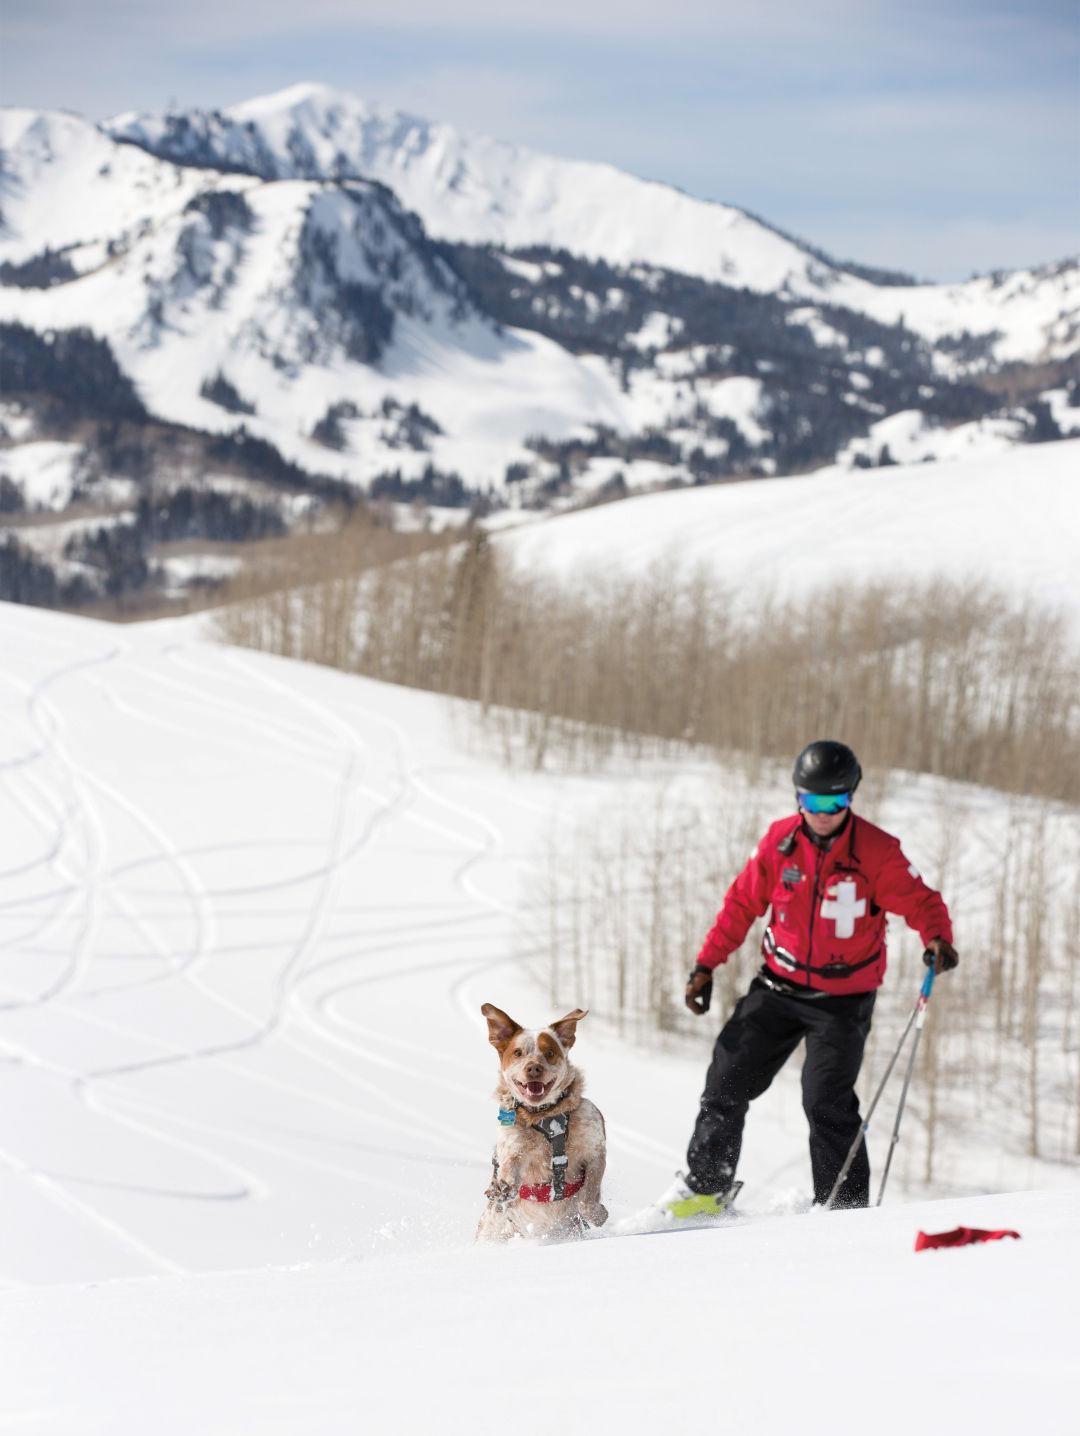 Mark Chytka, avalanche dog coordinator and ski patrol supervisor, and his dog, Rooster